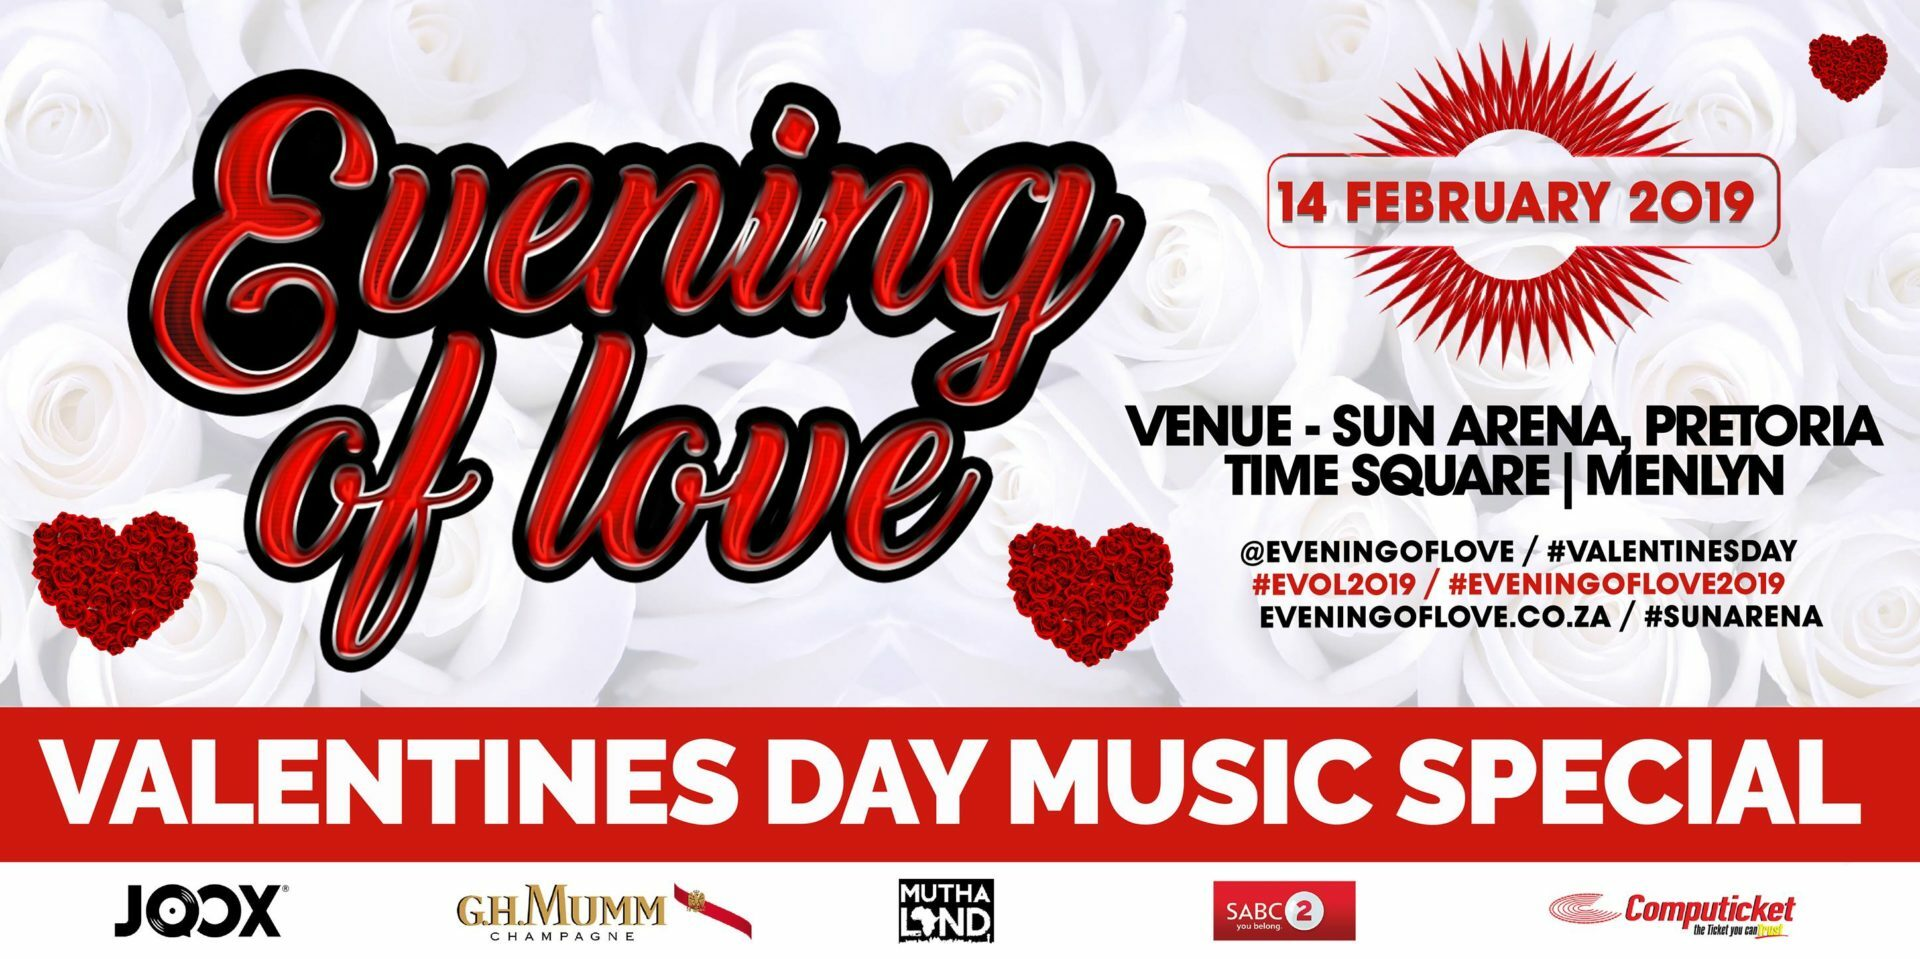 Fans can help pick the set-list for Vusi Nova's 'Evening of Love'